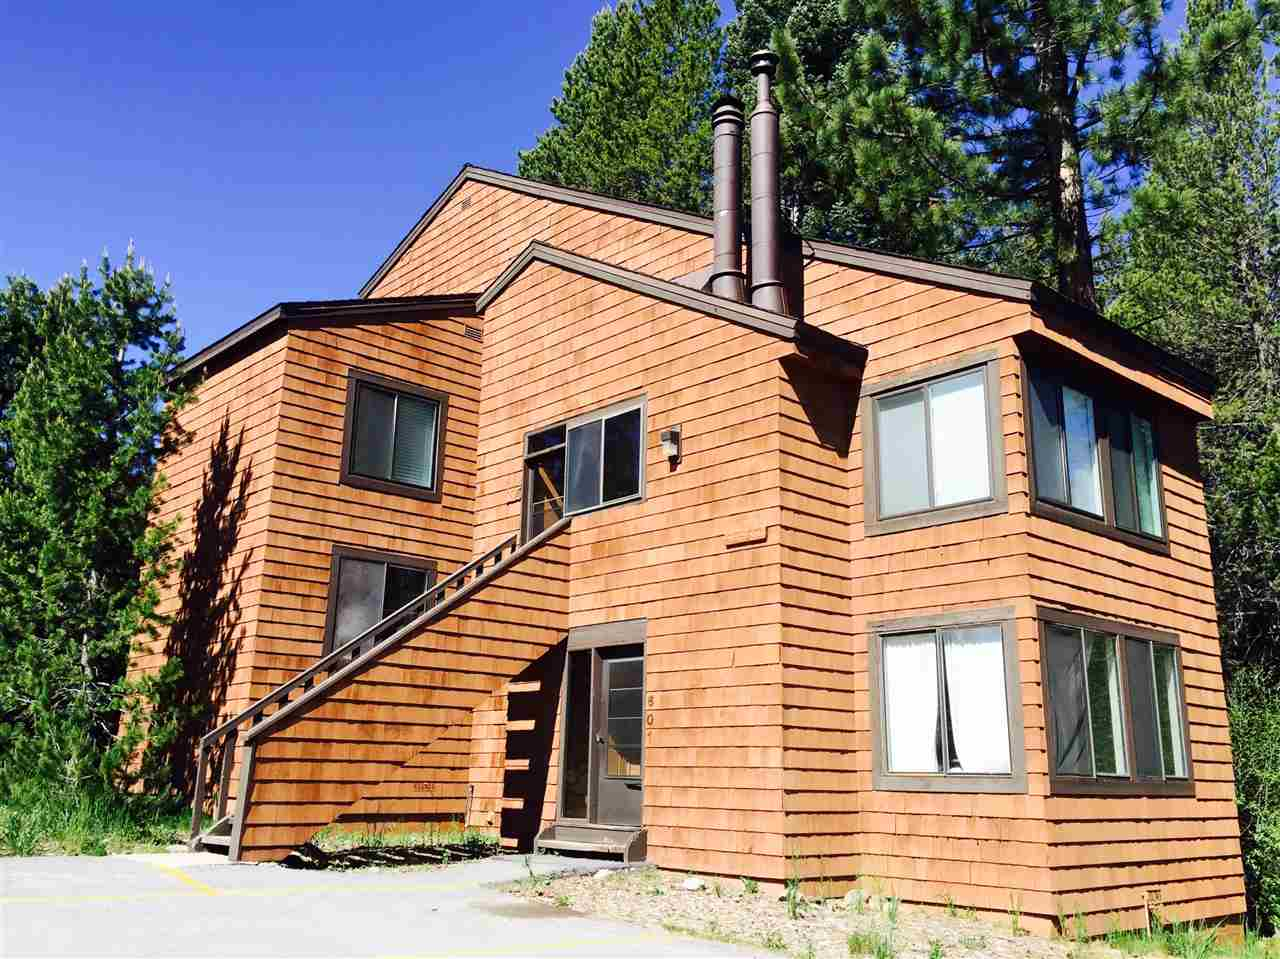 Condo / Townhouse for Active at 11511 Snowpeak Way 11511 Snowpeak Way Truckee, California 96161 United States